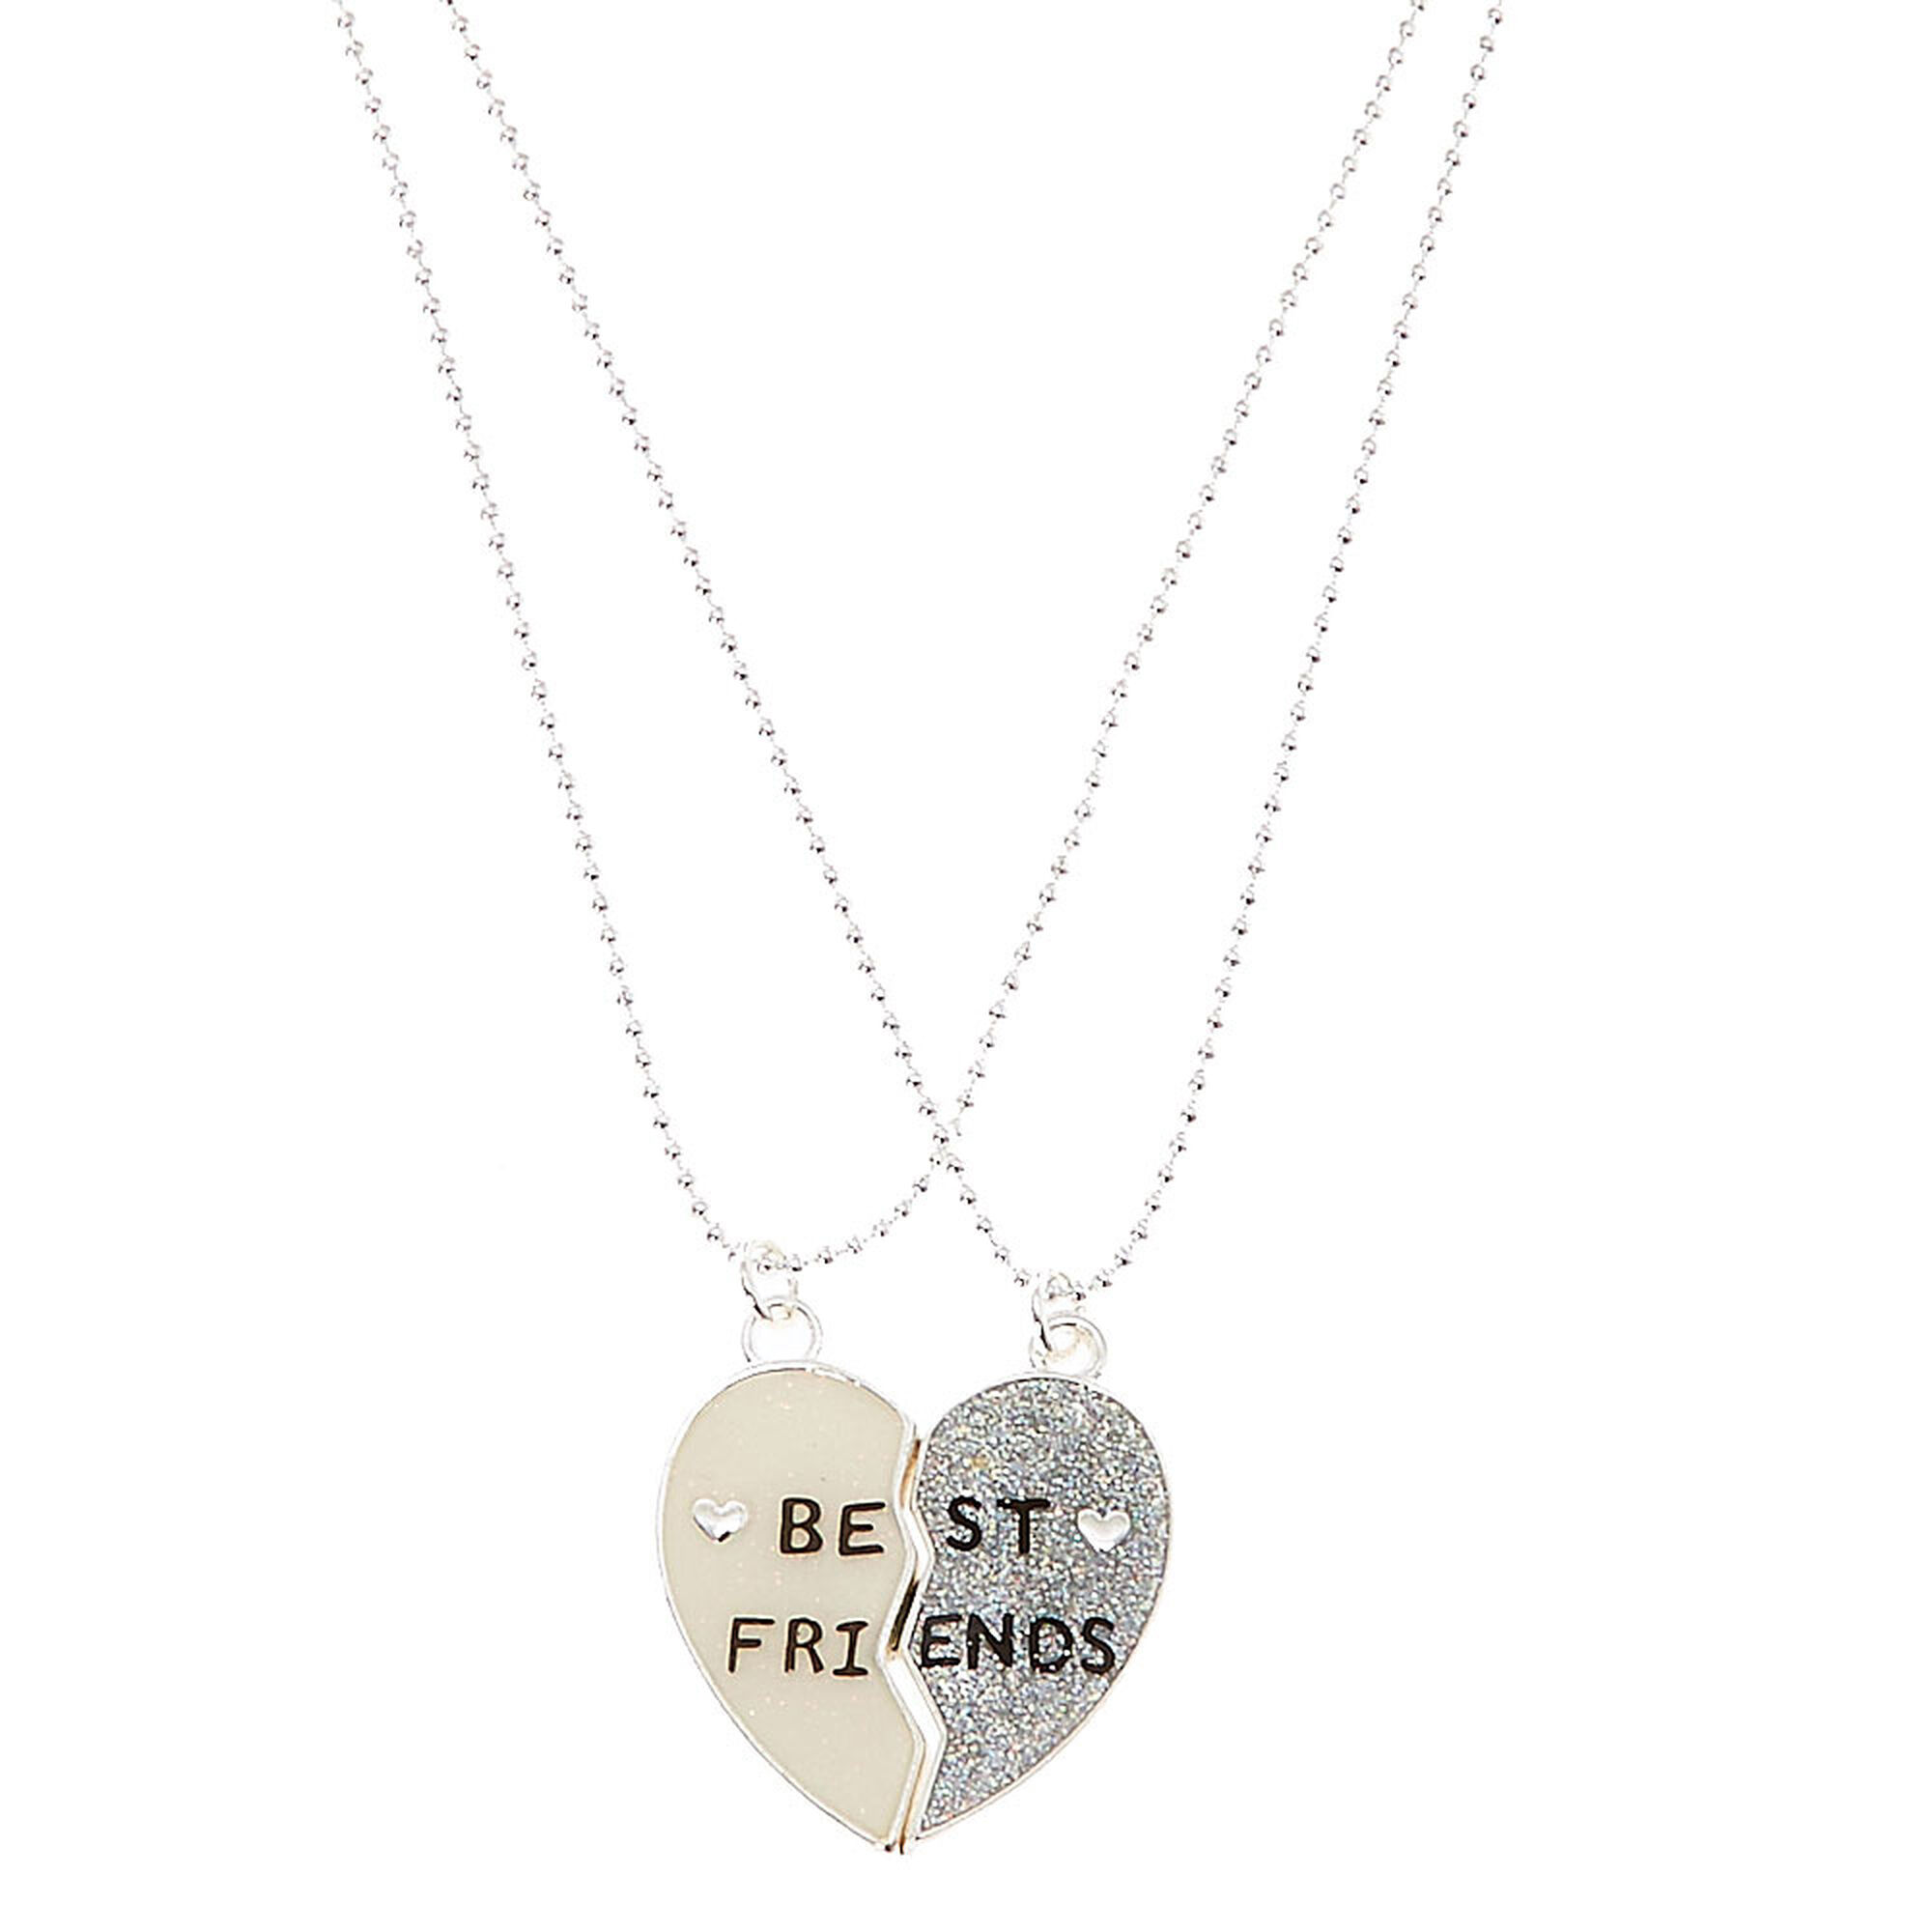 Broken heart best friends necklaces claires us broken heart best friends necklaces mozeypictures Choice Image